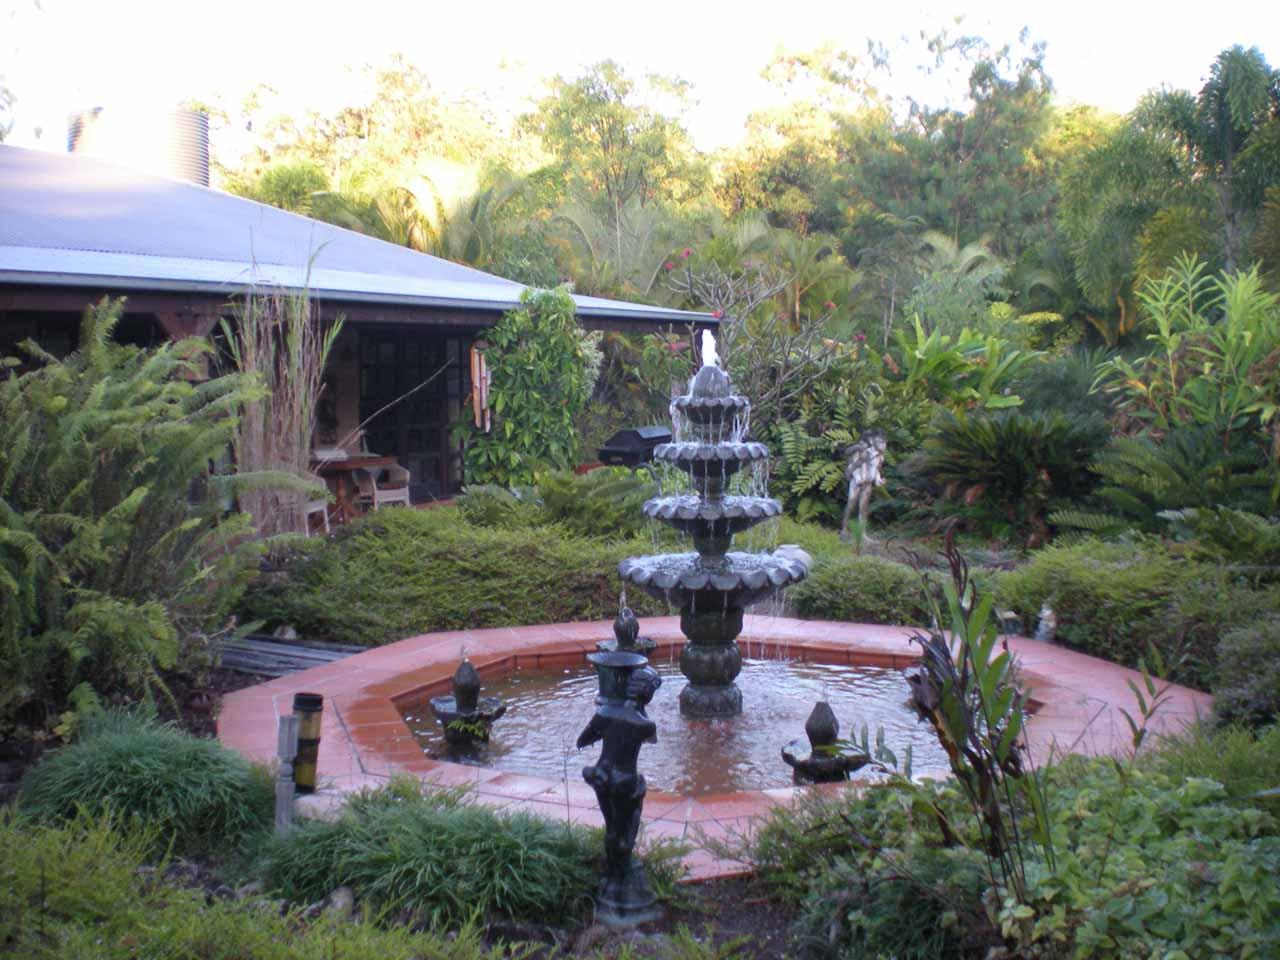 Morning at the Mudbrick Manor